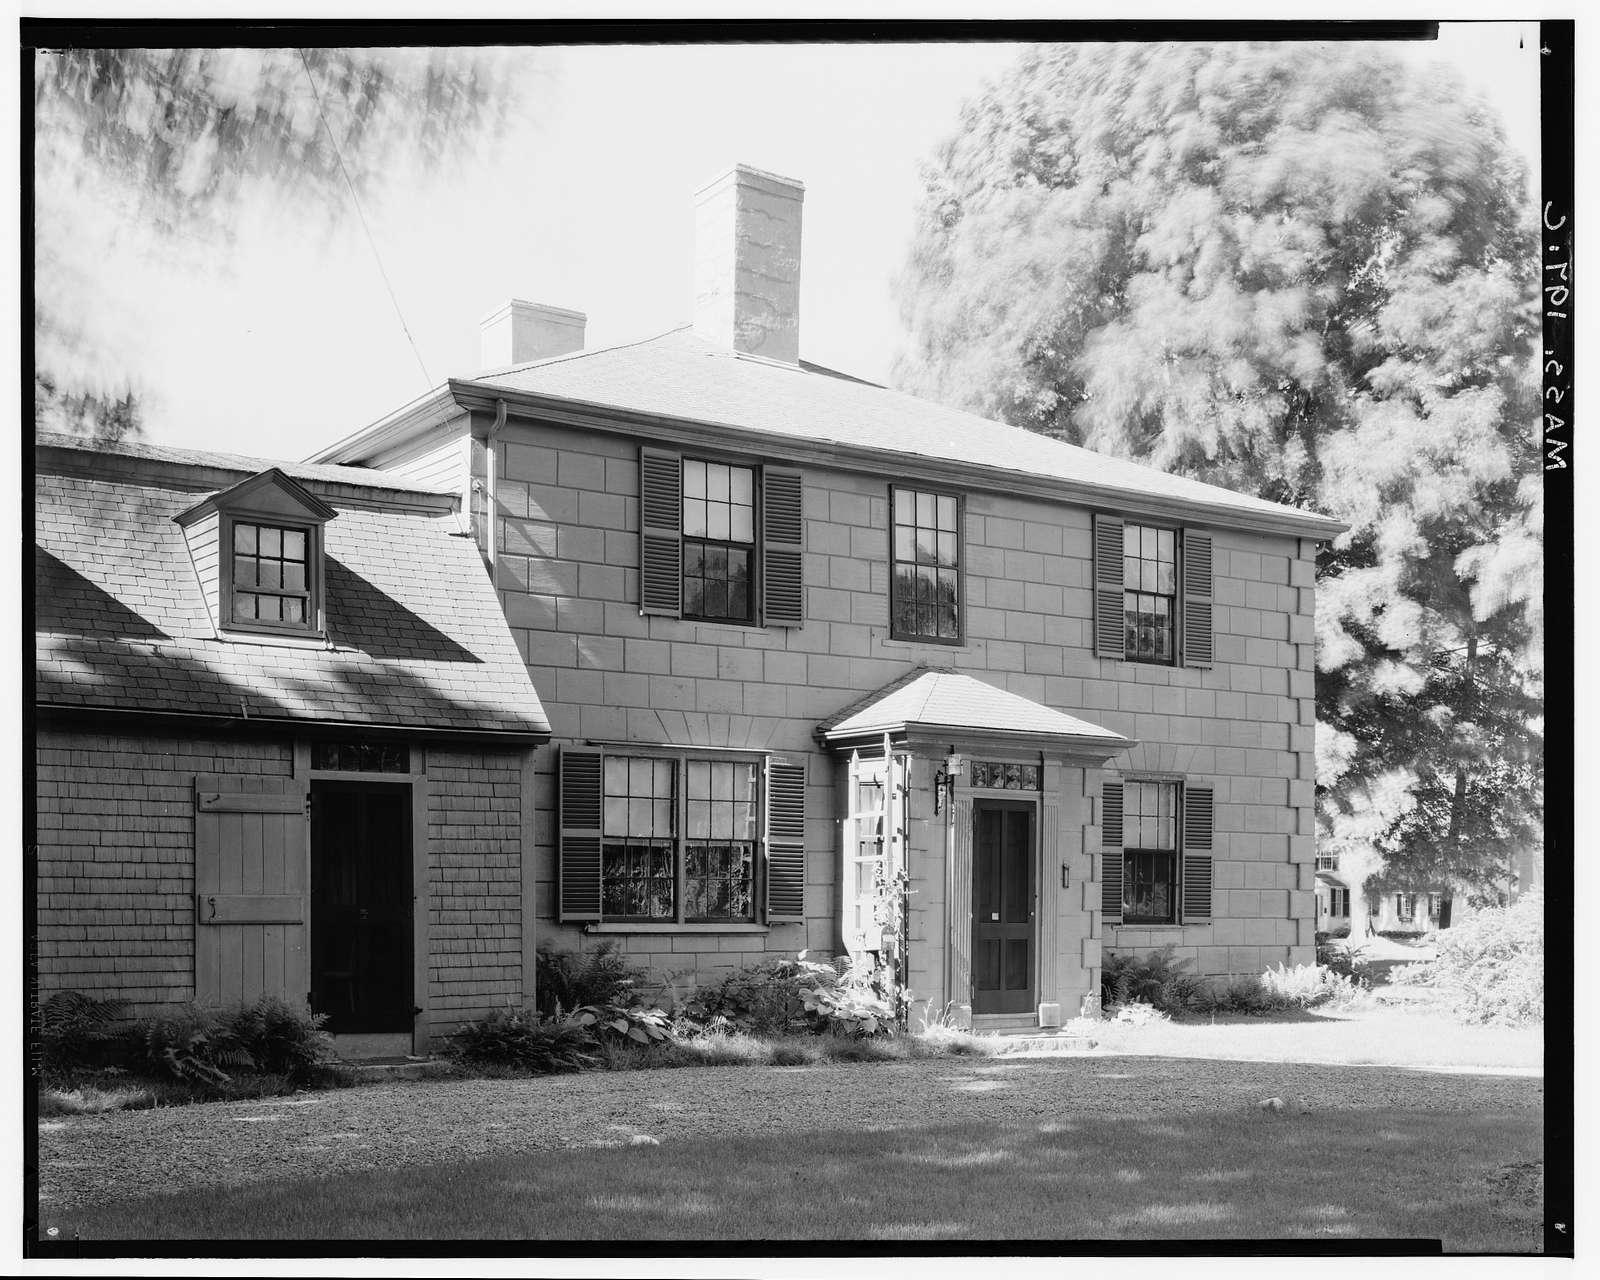 Daniel Shute House, Main & South Pleasant Streets, Hingham, Plymouth County, MA